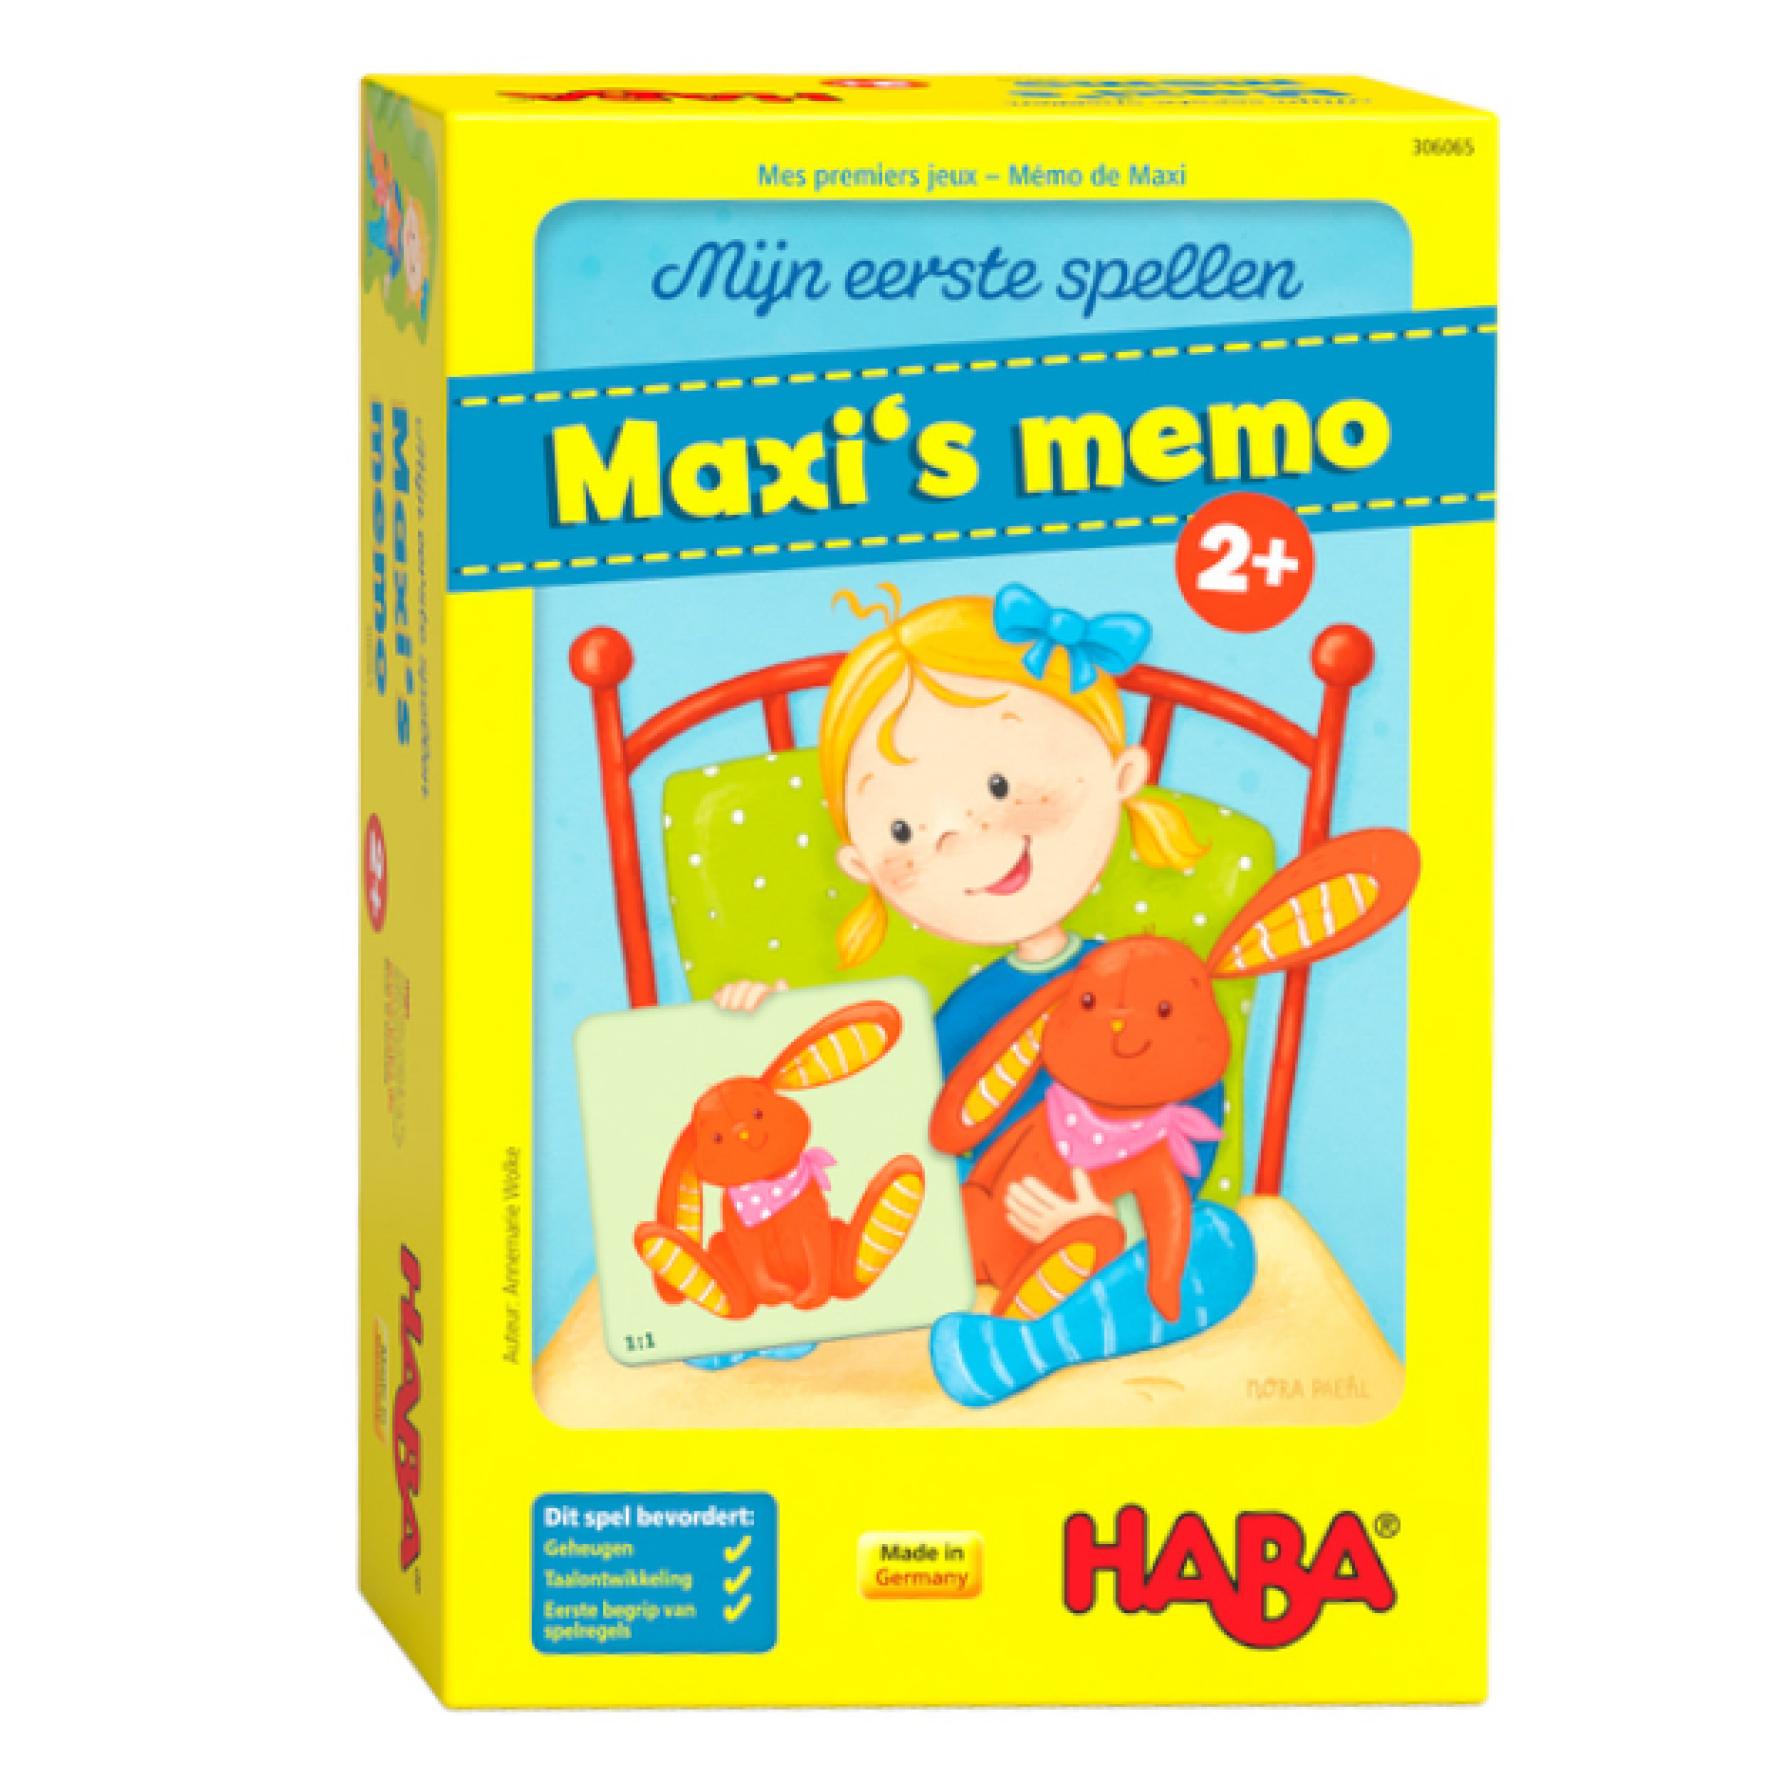 Spel - Maxi s memo - 2+